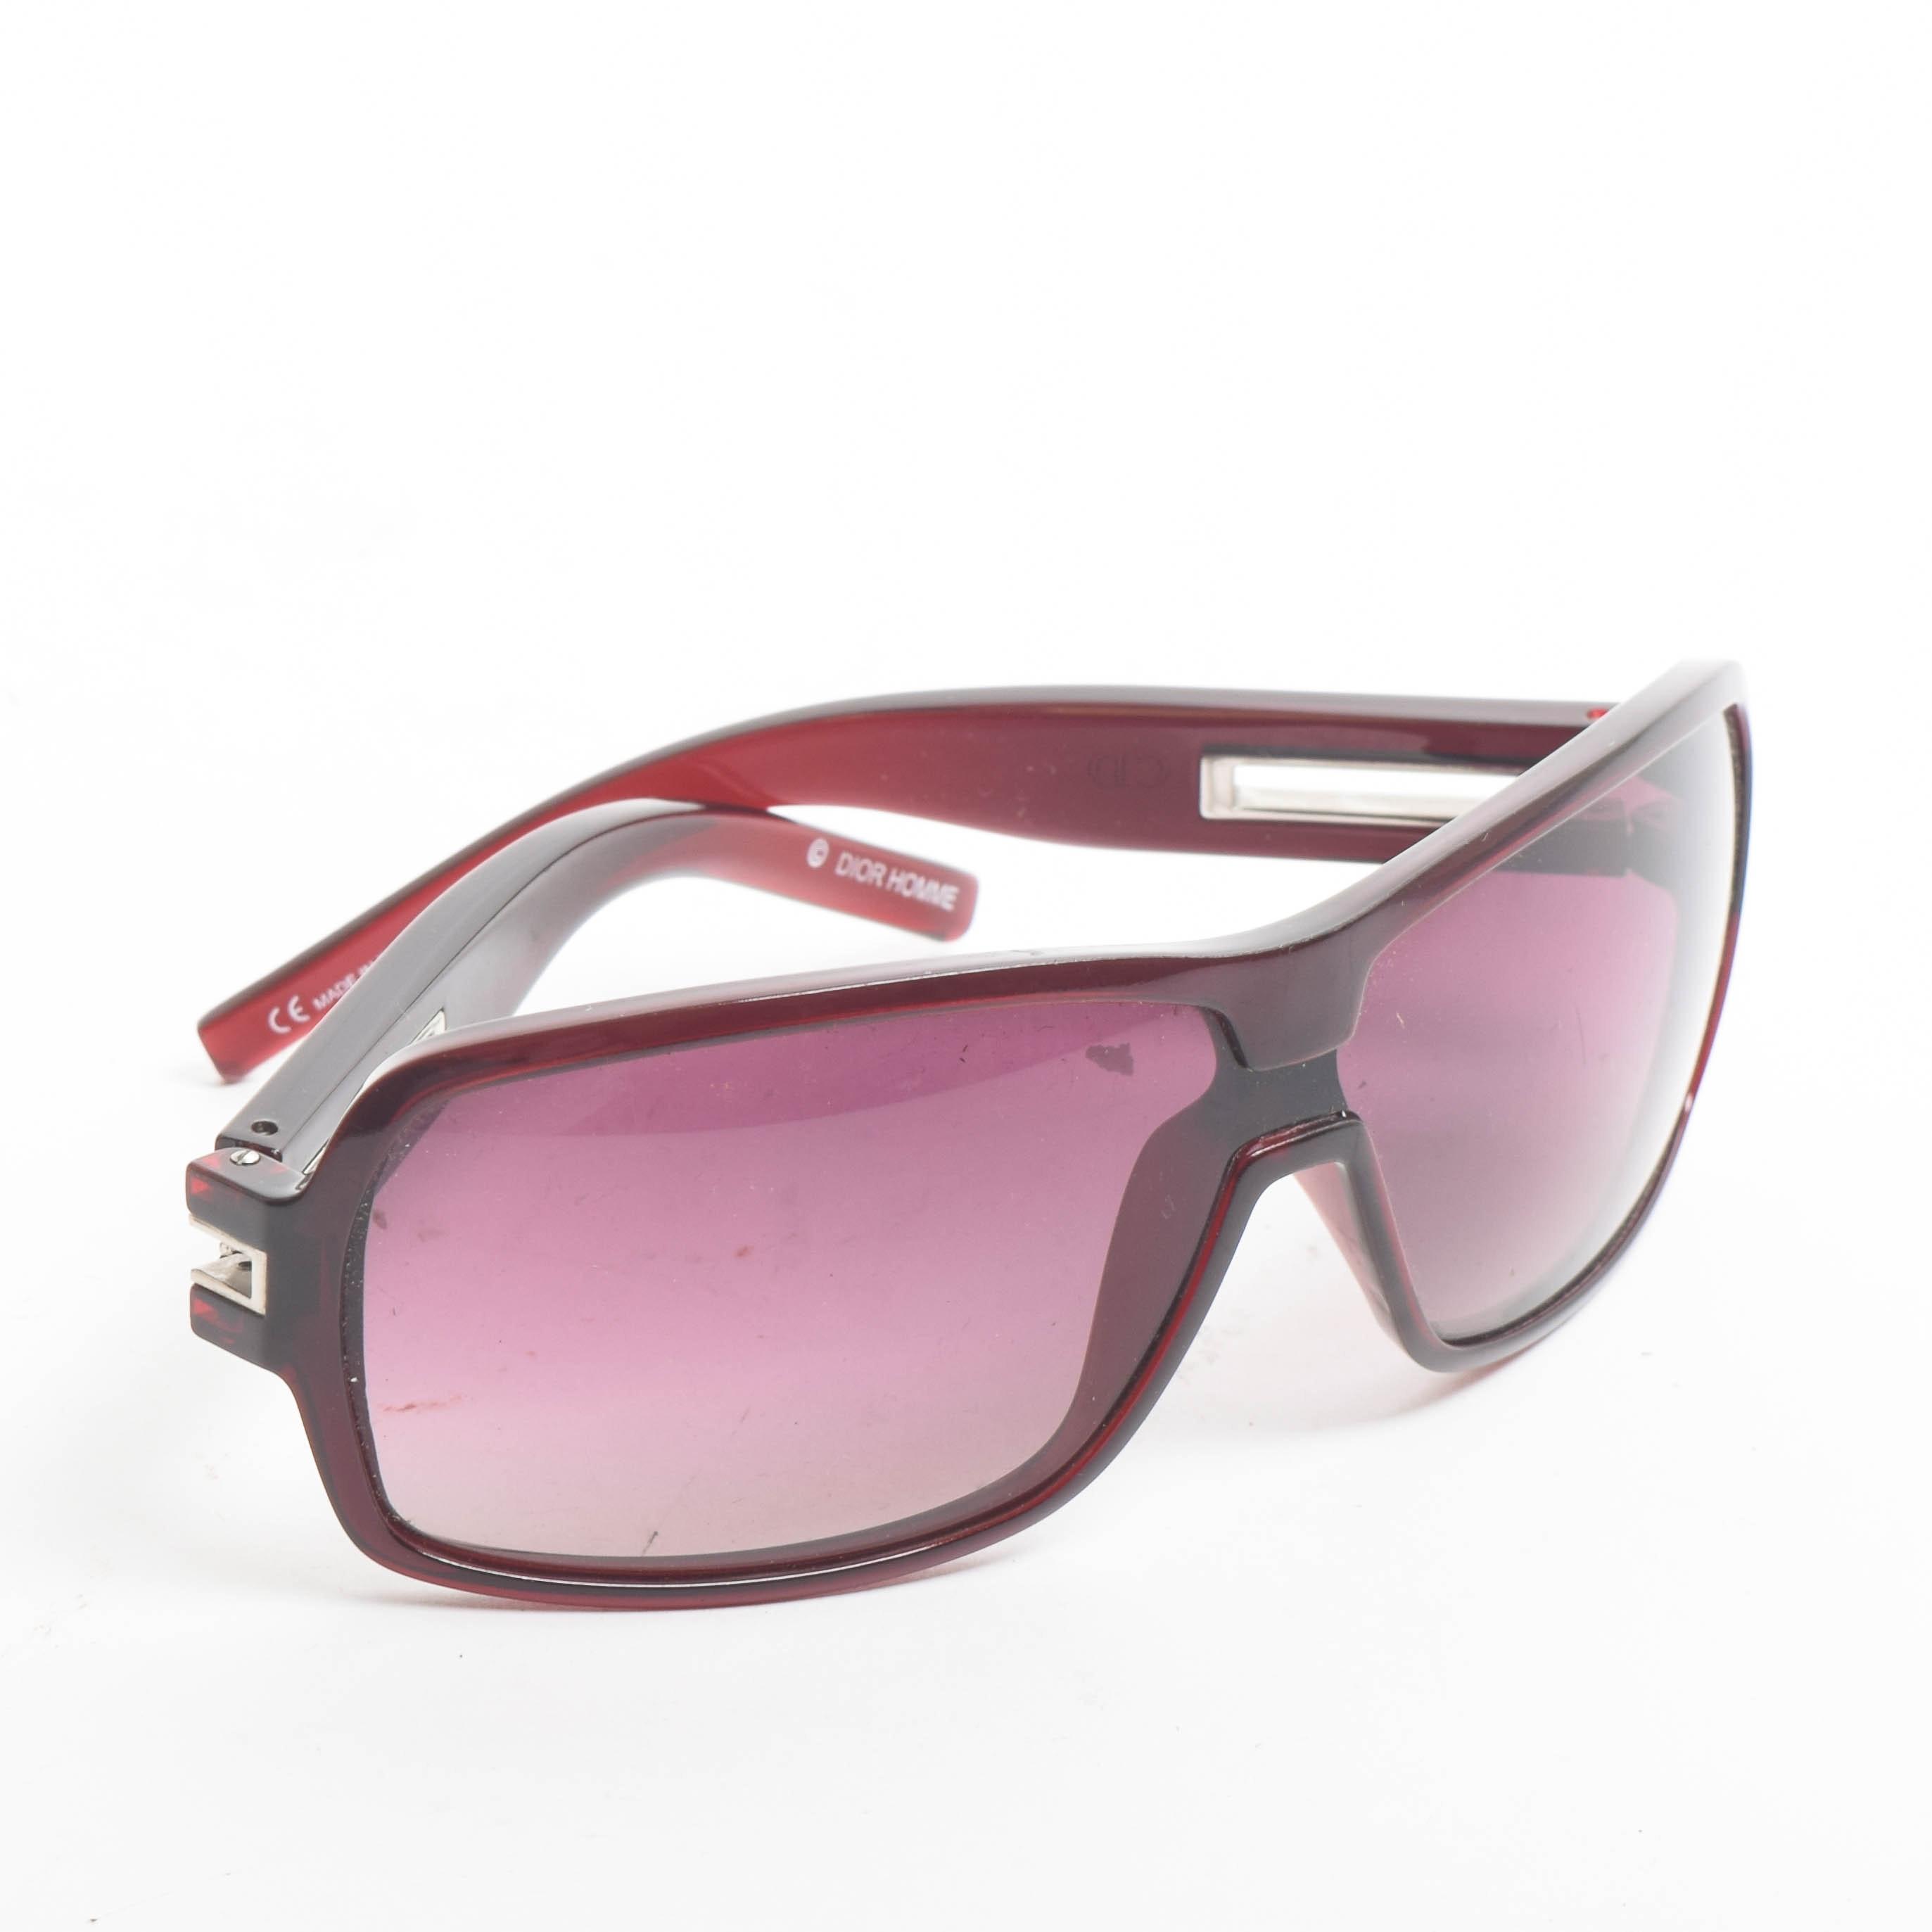 Men's Christian Dior Sunglasses